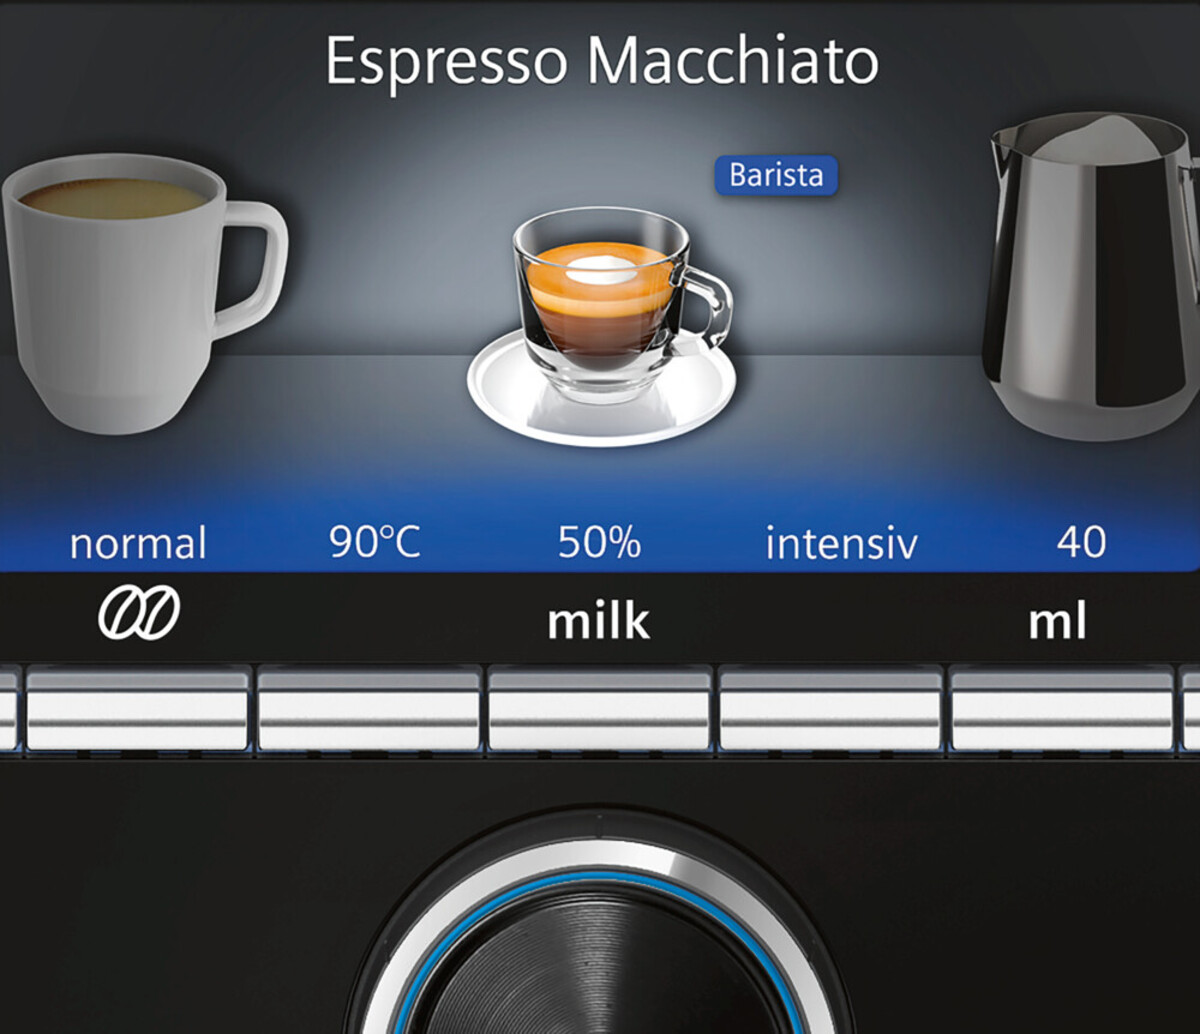 Bild 5 von SIEMENS EQ.9 plus connect s700 TI9578X1DE Edelstahl Kaffeevollautomat